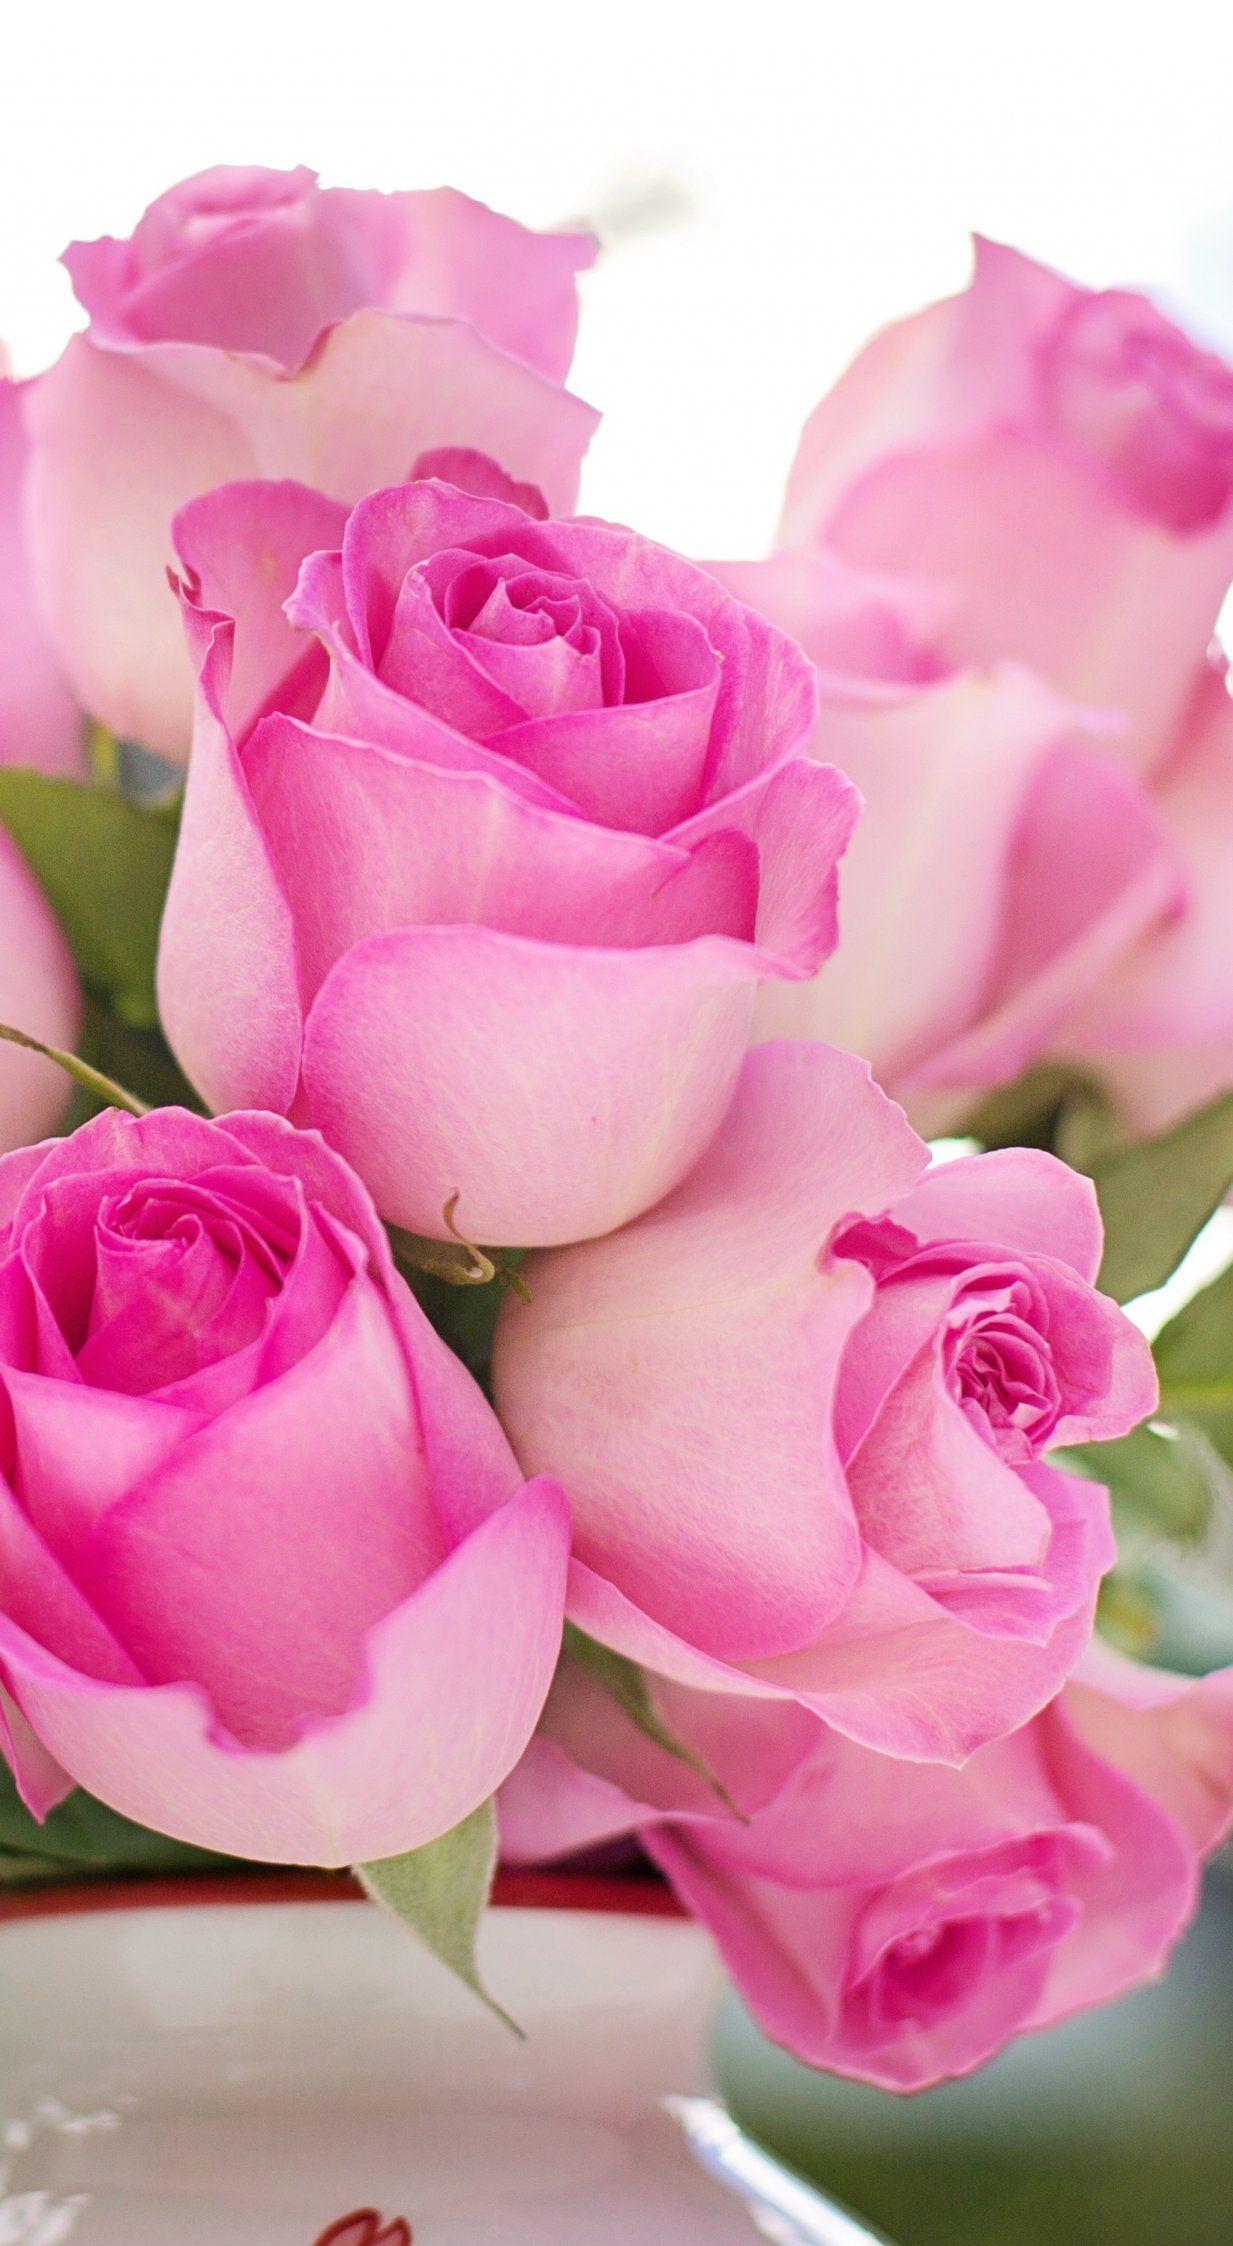 Pink Roses Flowers Romance Romantic Love Valentine Floral